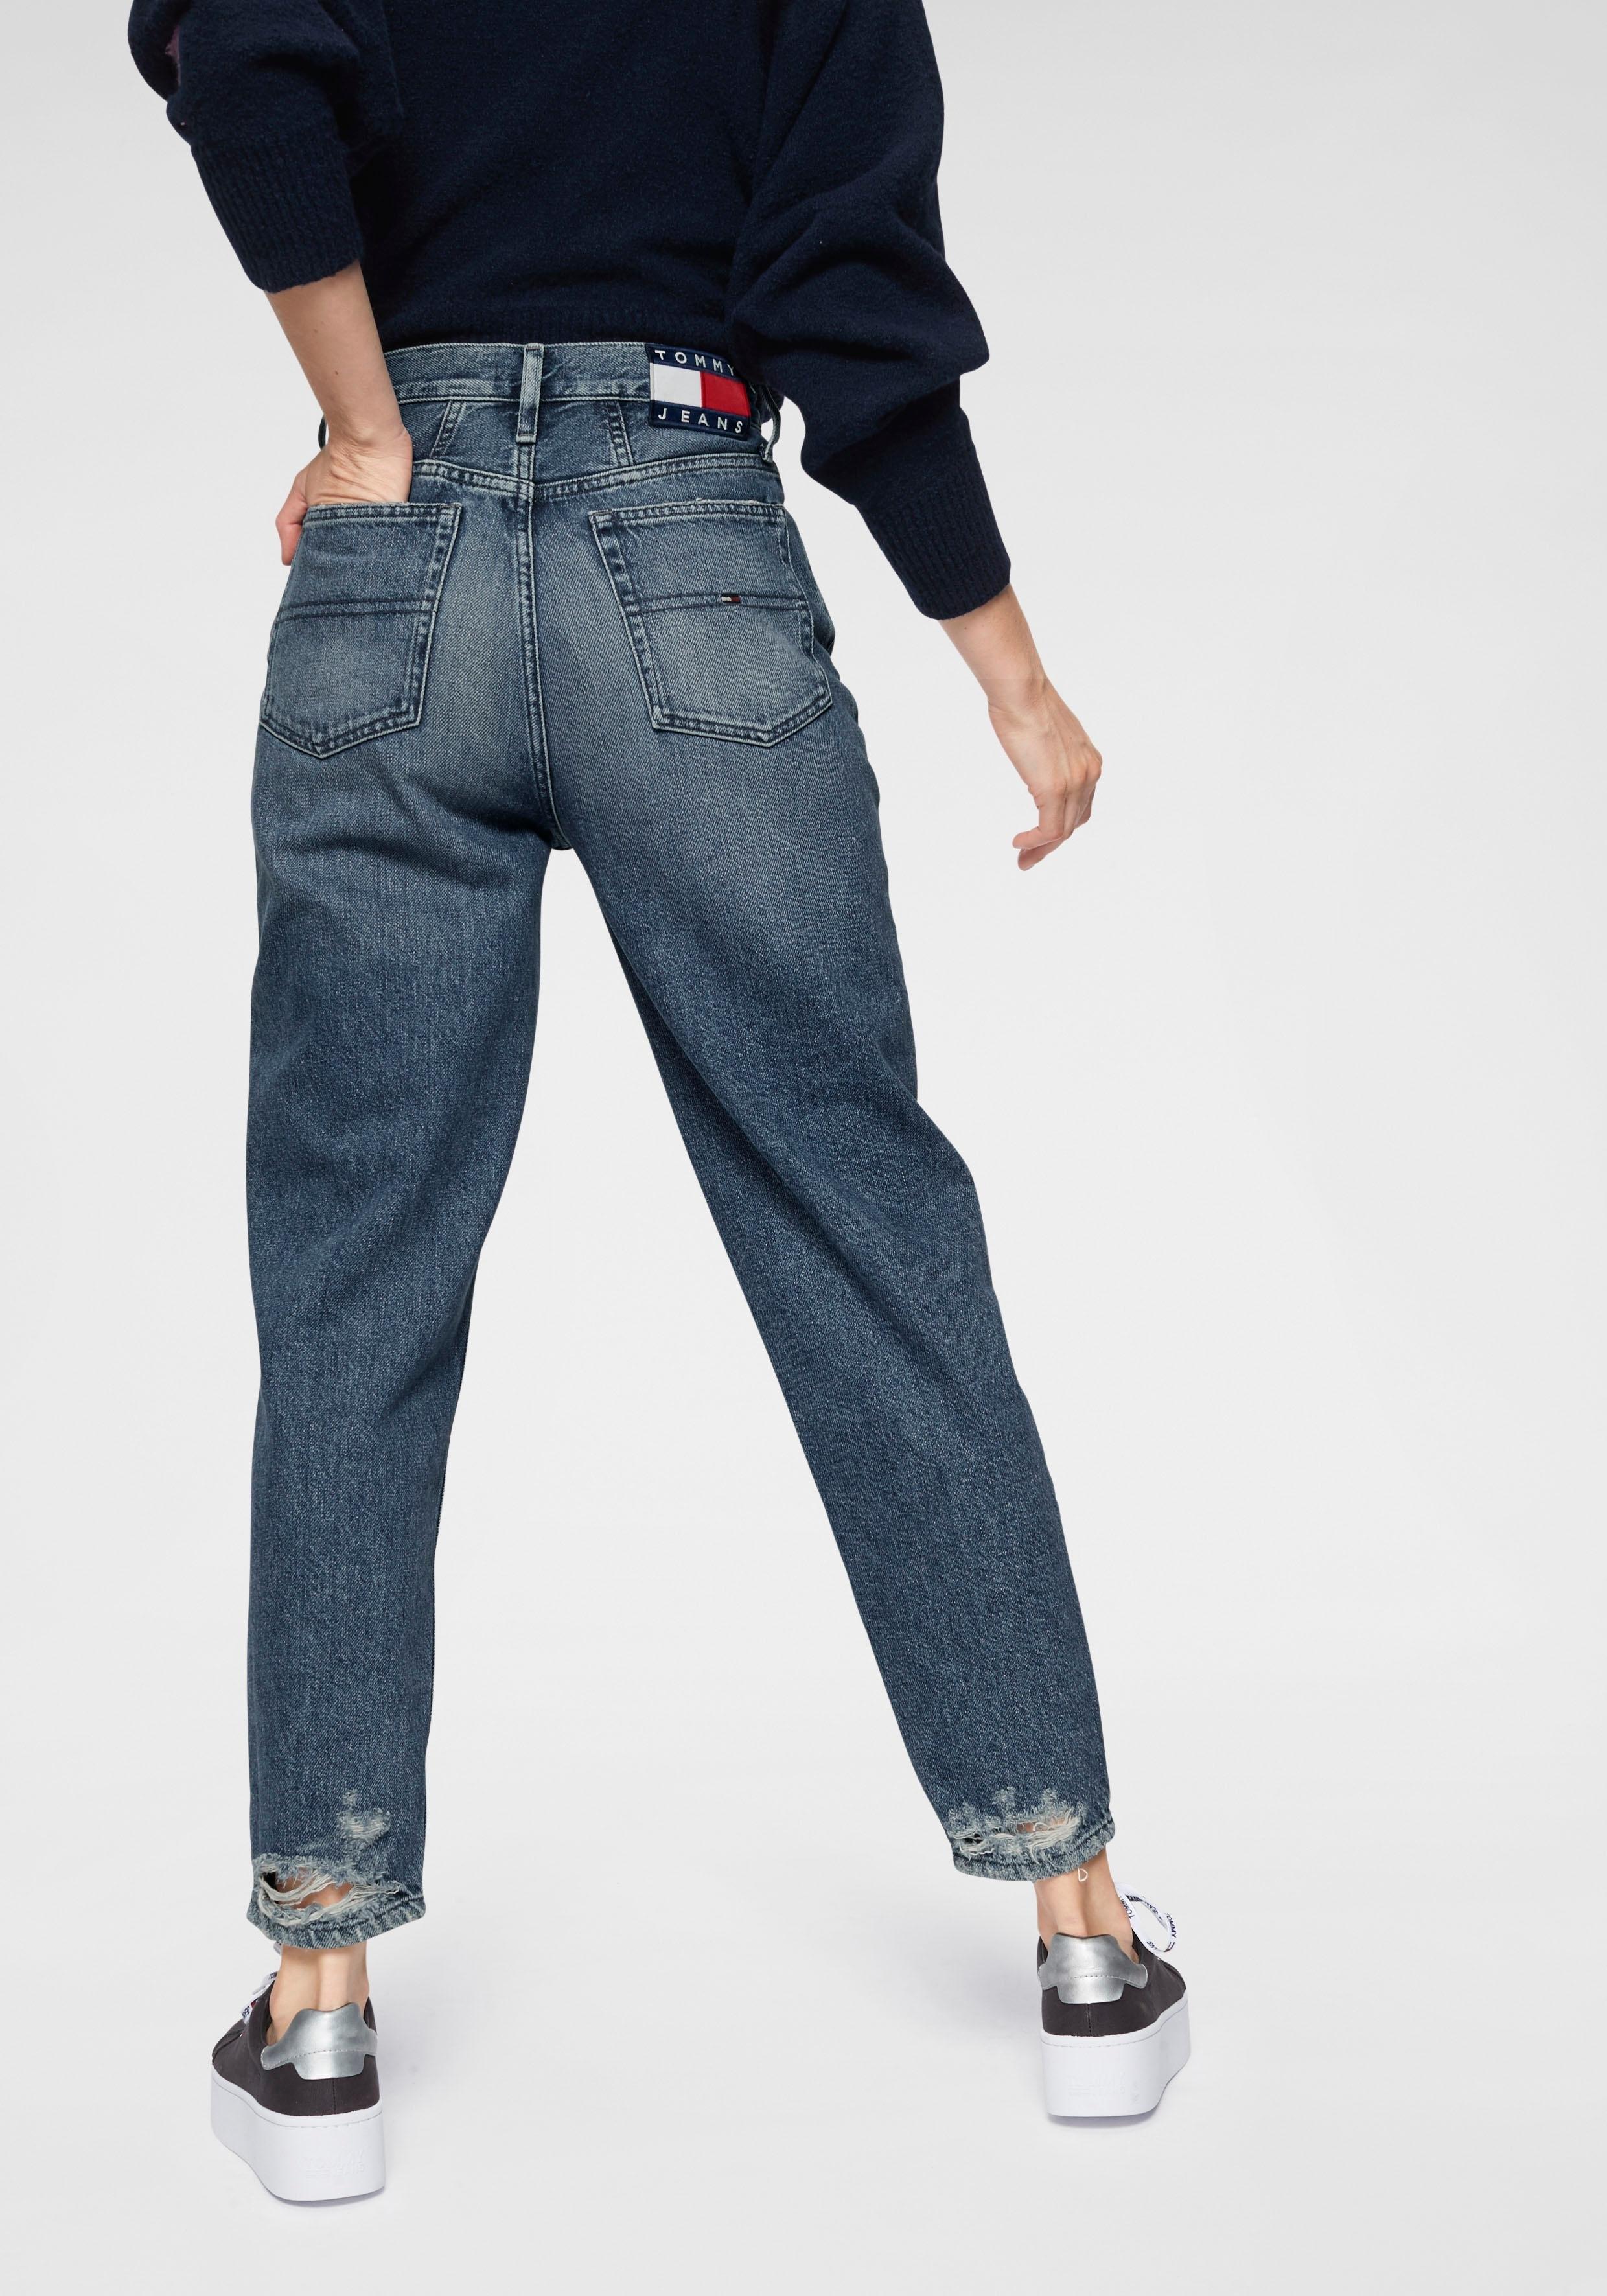 Tommy Jeans tapered fit jeans - verschillende betaalmethodes